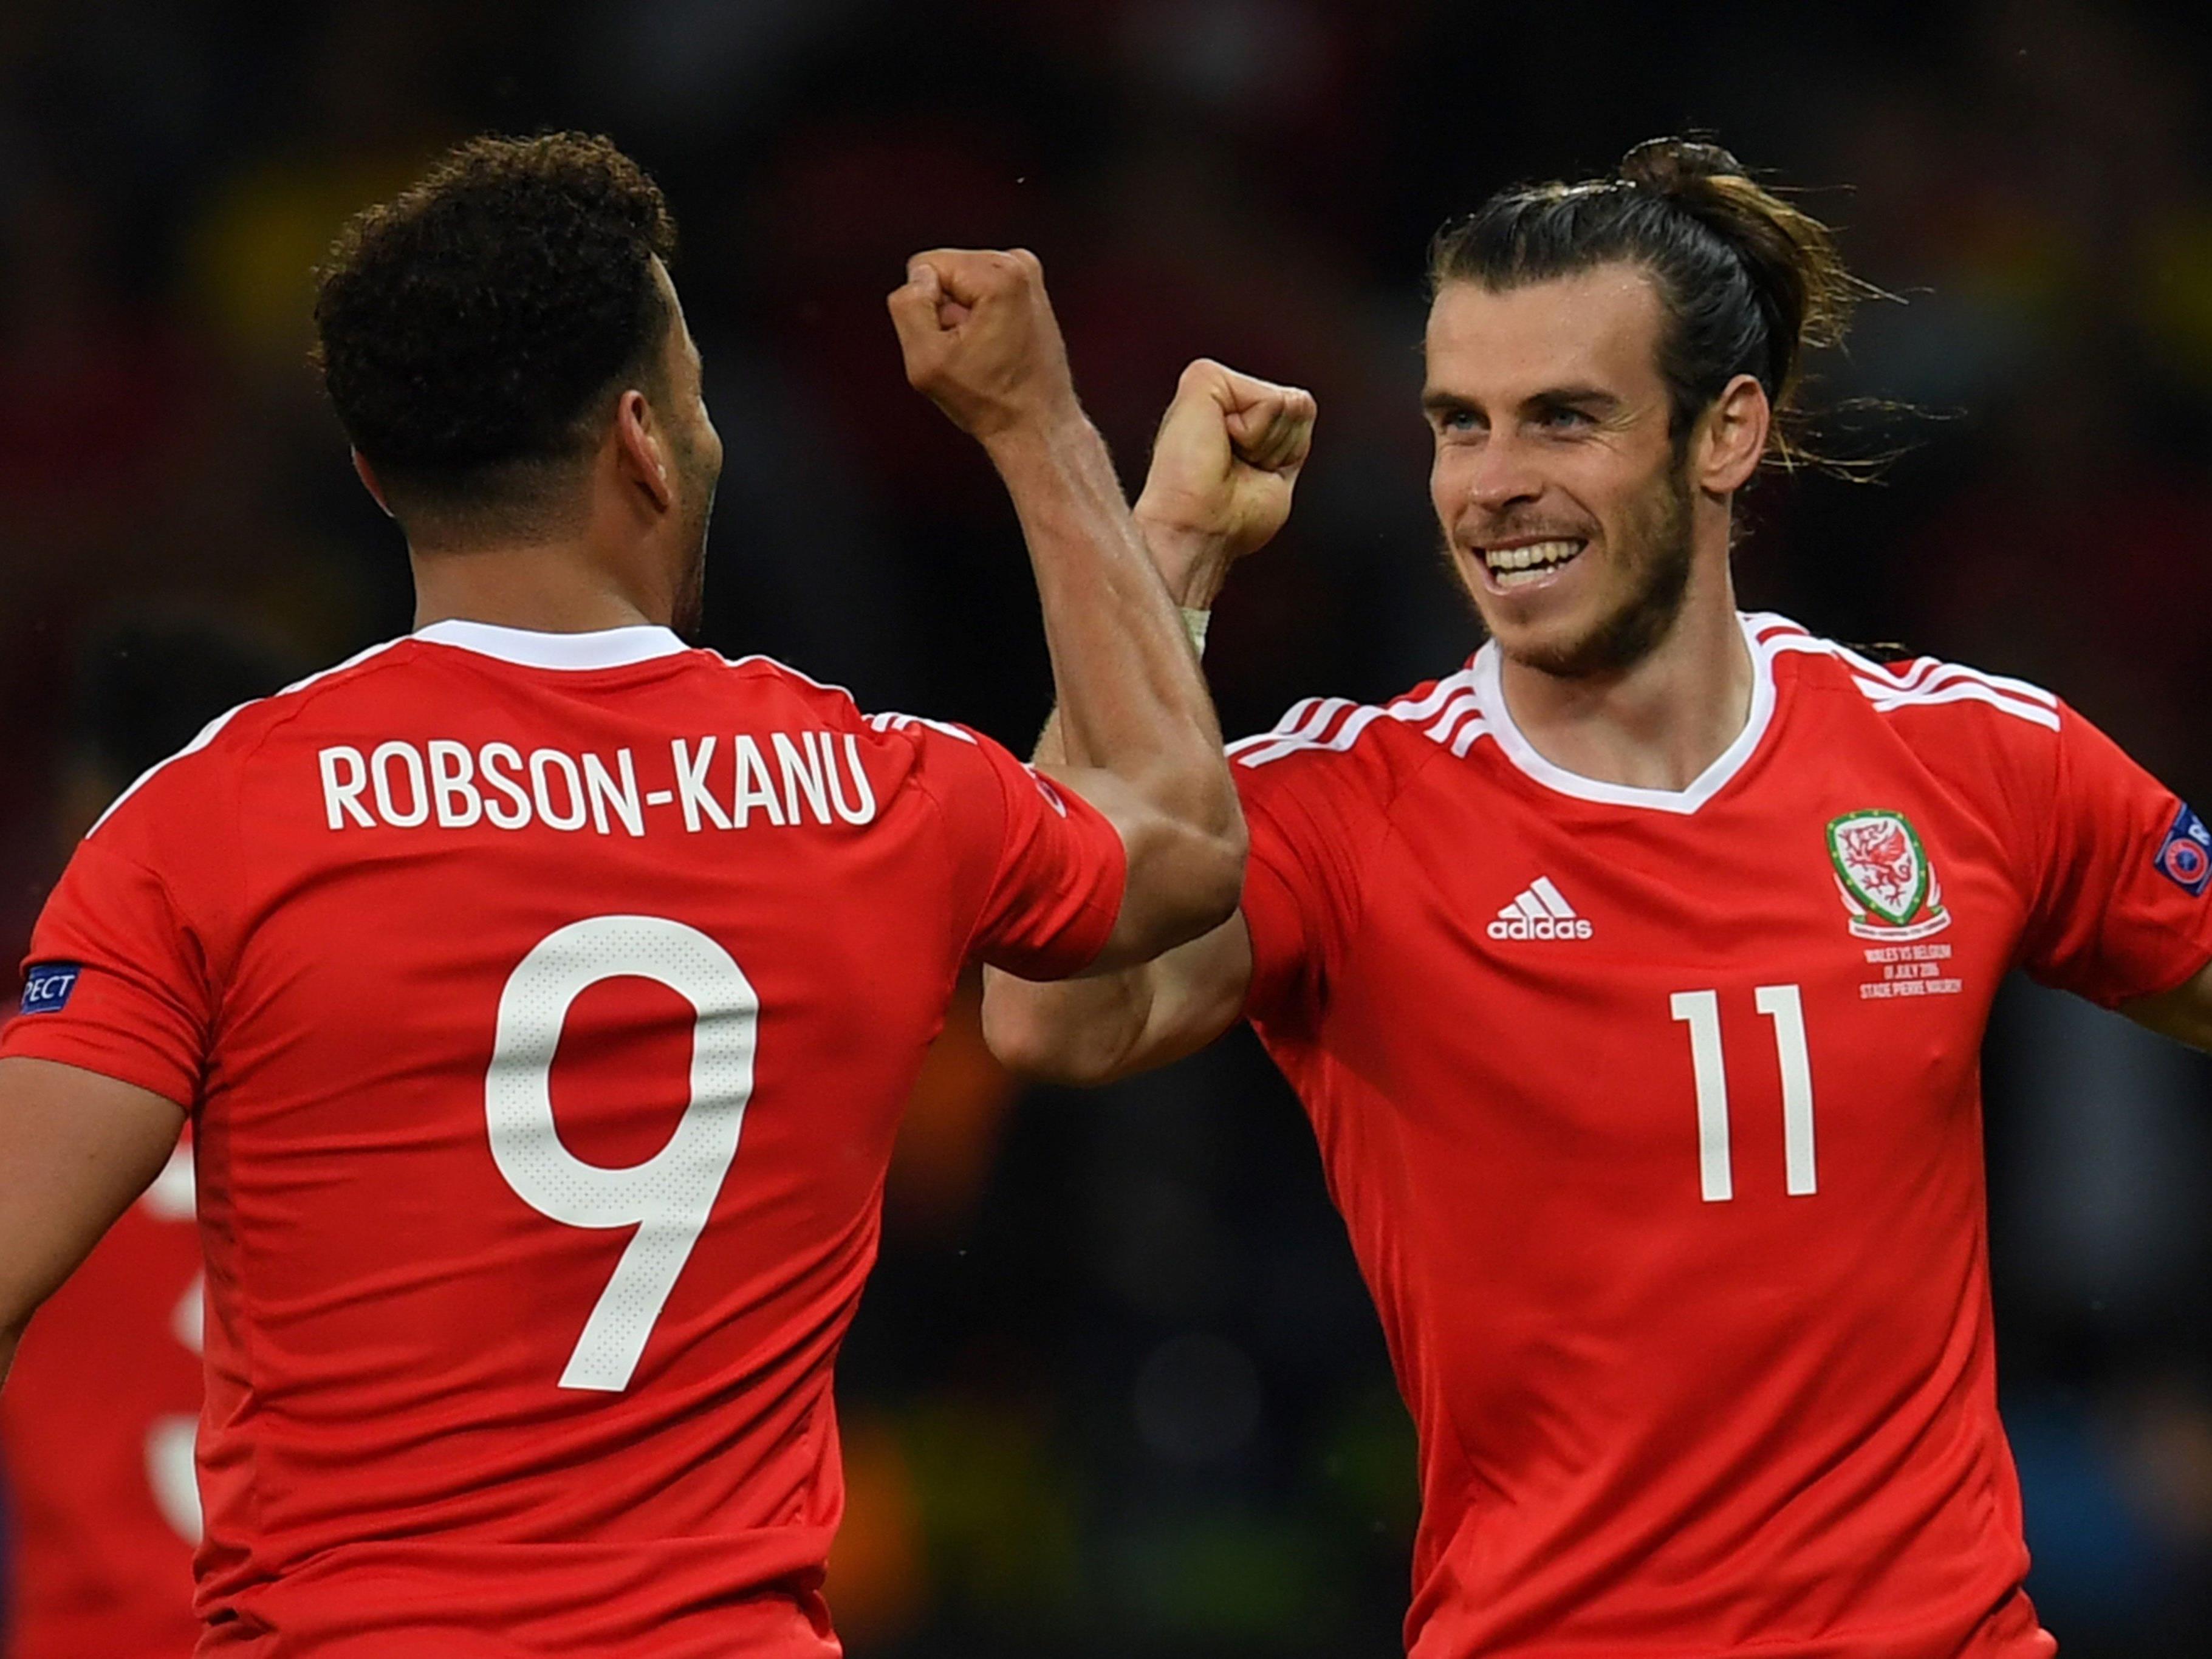 Wales-Superstar Bale (r.) jubelt mit Robson-Kanu, dem Torschützen zum 2:1.